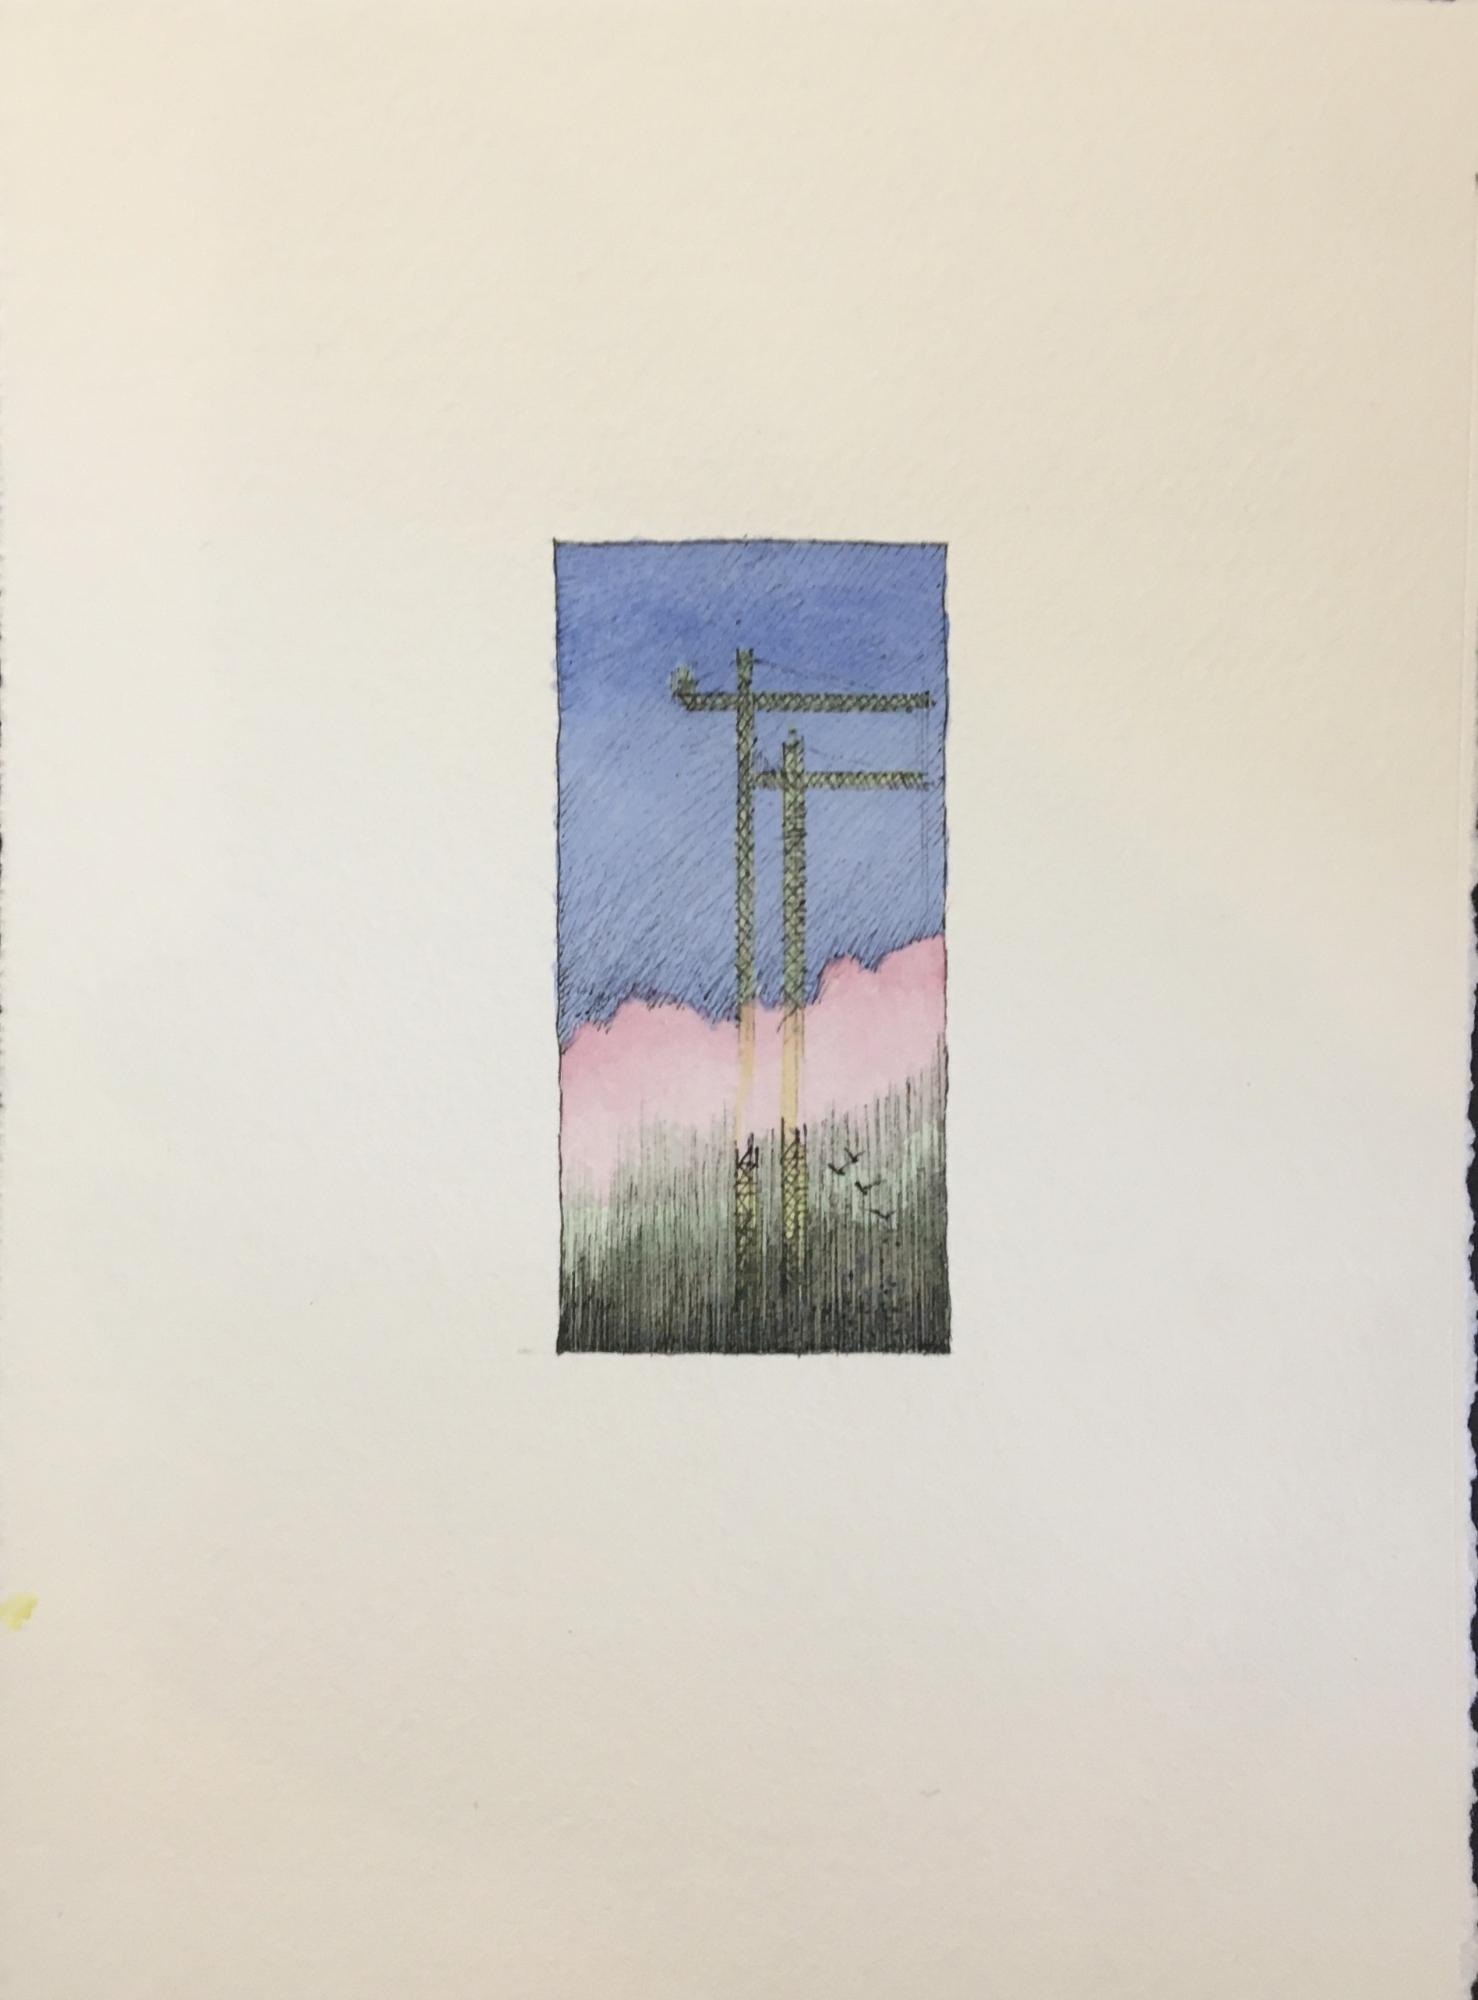 Crane/Cranes by J. Joel